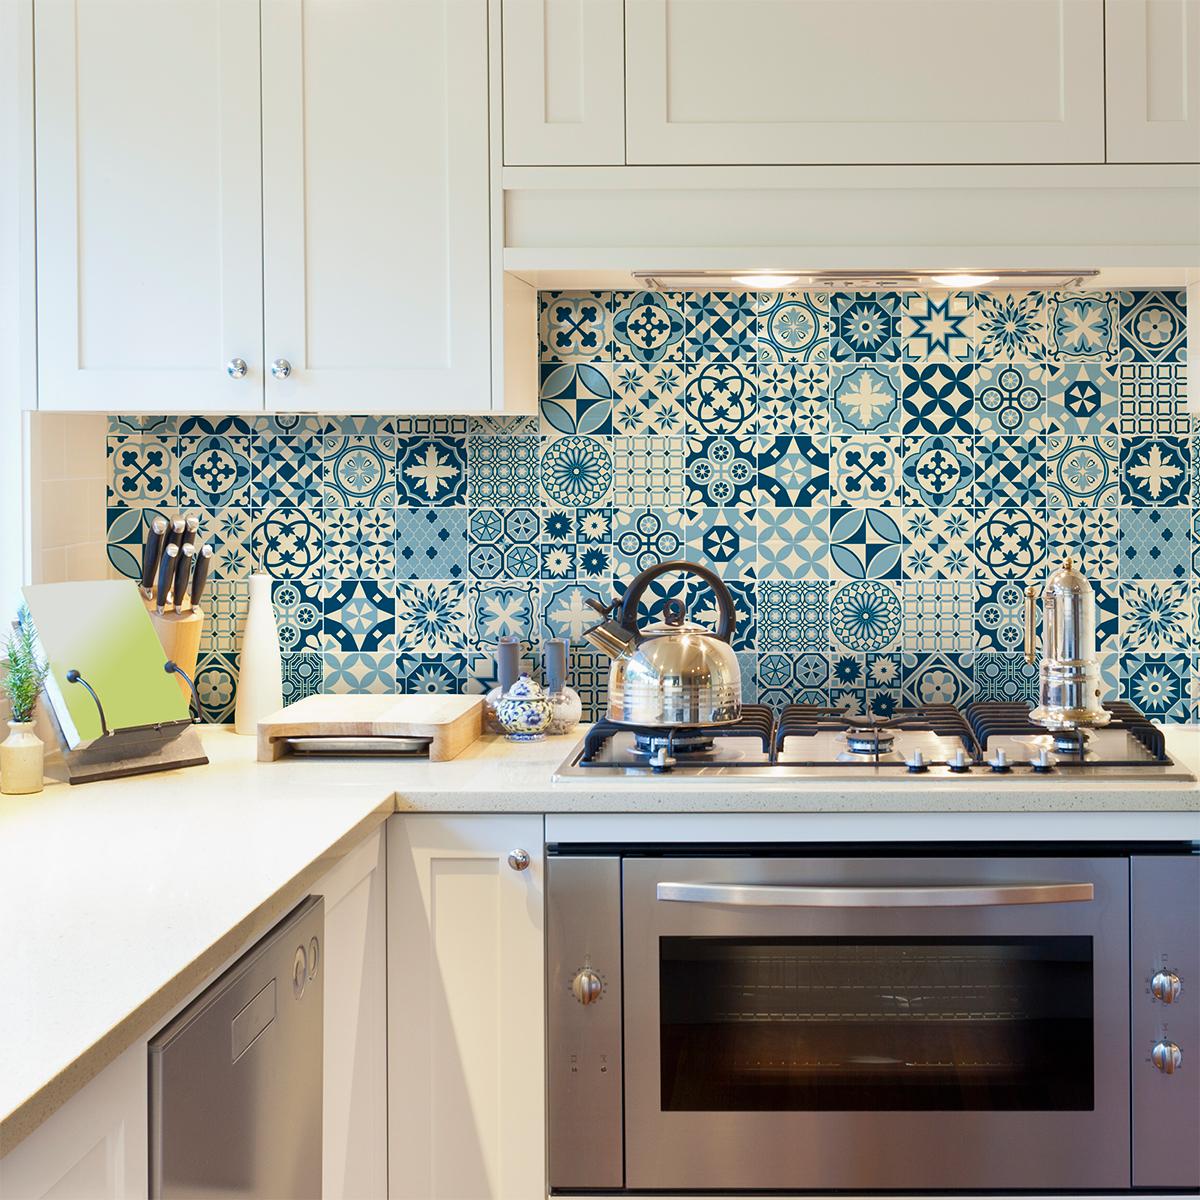 60 stickers carreaux de ciment azulejos riana cuisine for Stickers cuisine carreaux de ciment